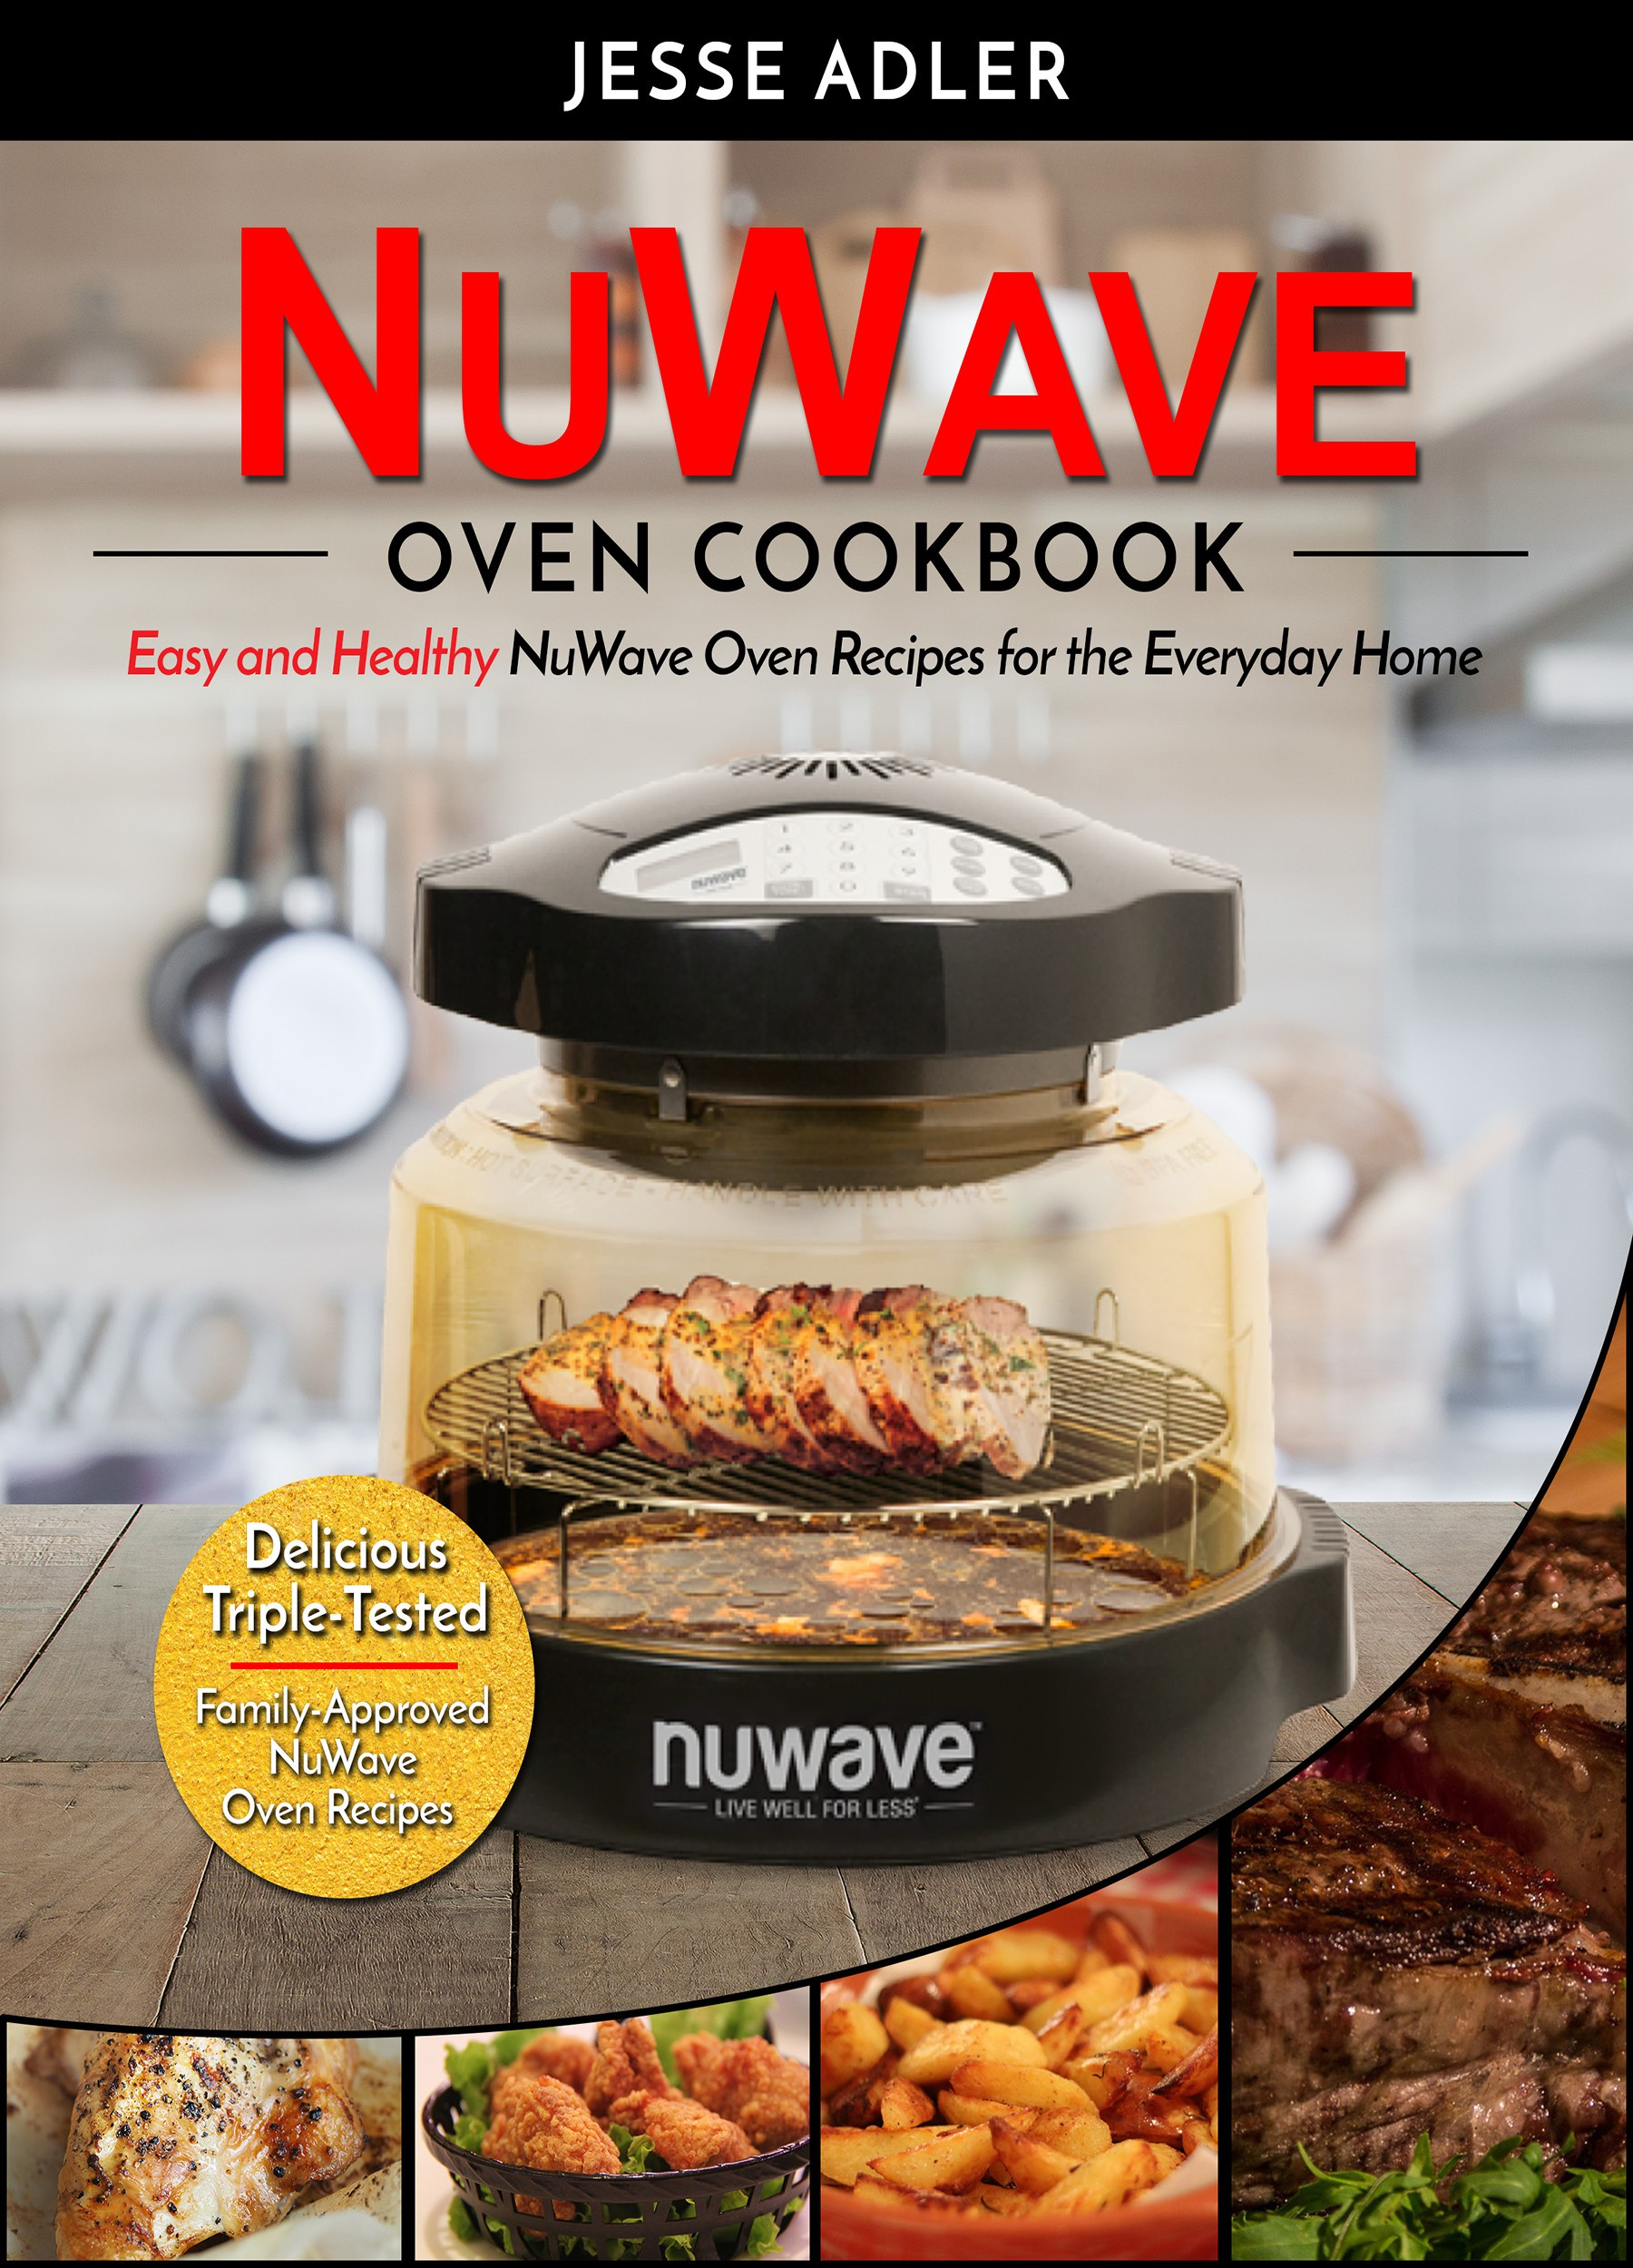 NuWave Oven Cookbook - Book Cover!